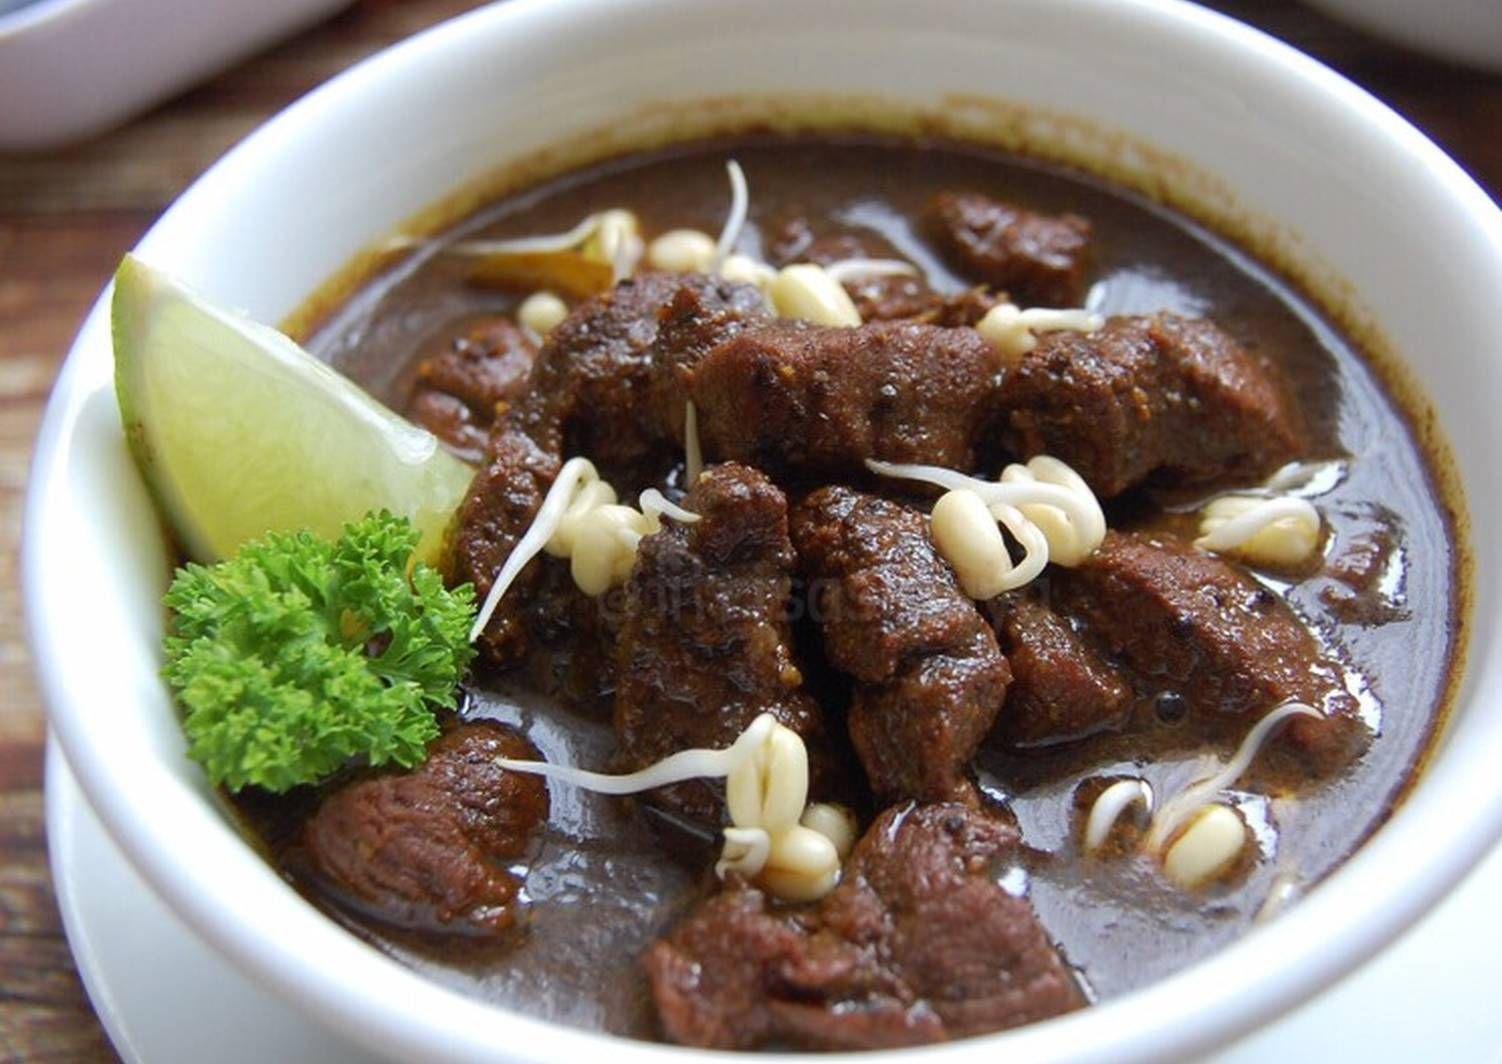 Resep Rawon Yummy Oleh Fitri Sasmaya Resep Resep Makanan Resep Masakan